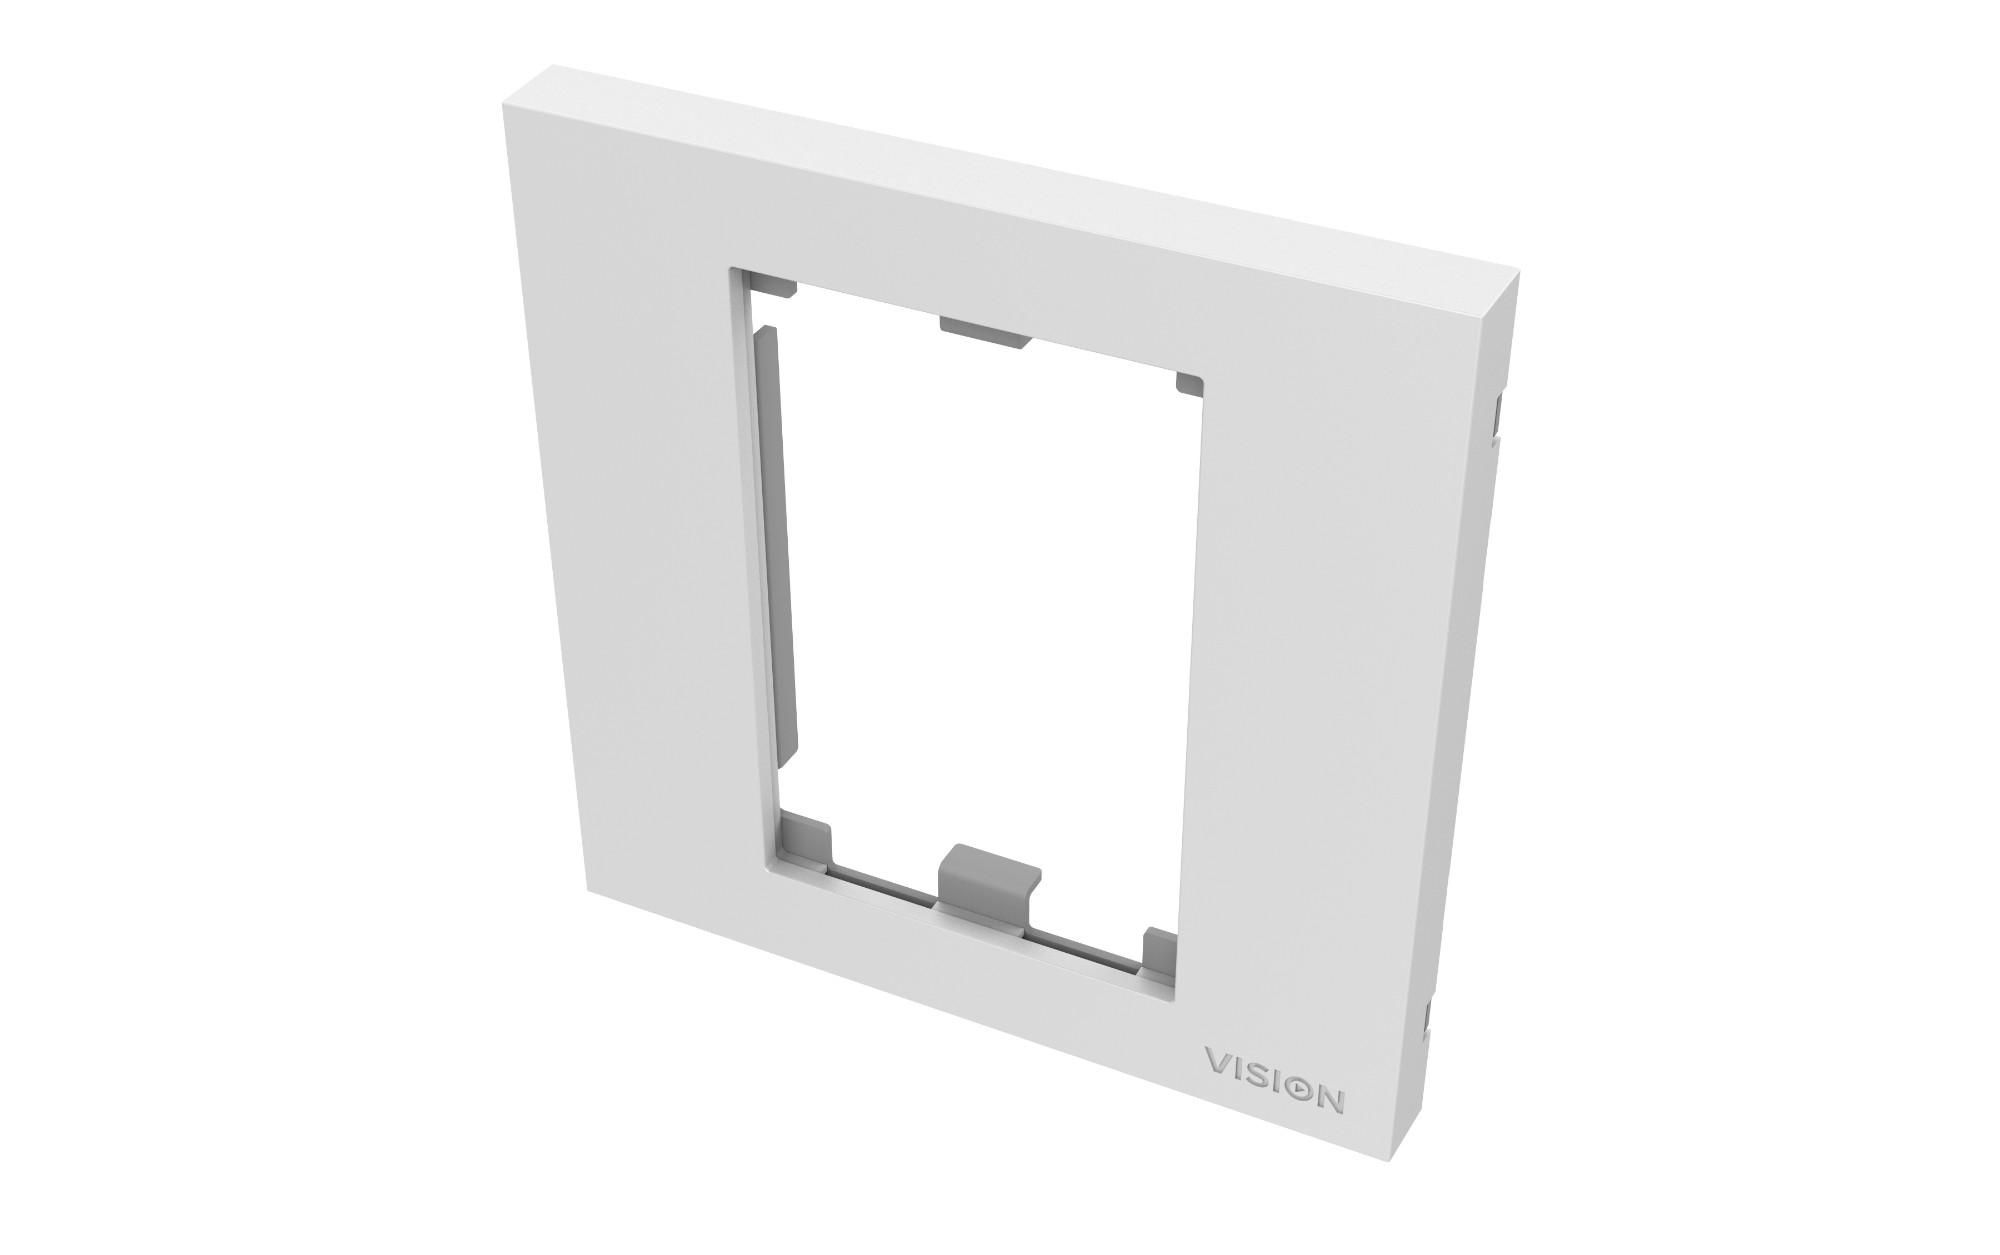 V3 Single-gang Uk Surroundwhite Single-gang Frame Which Accommodates Two Modules.